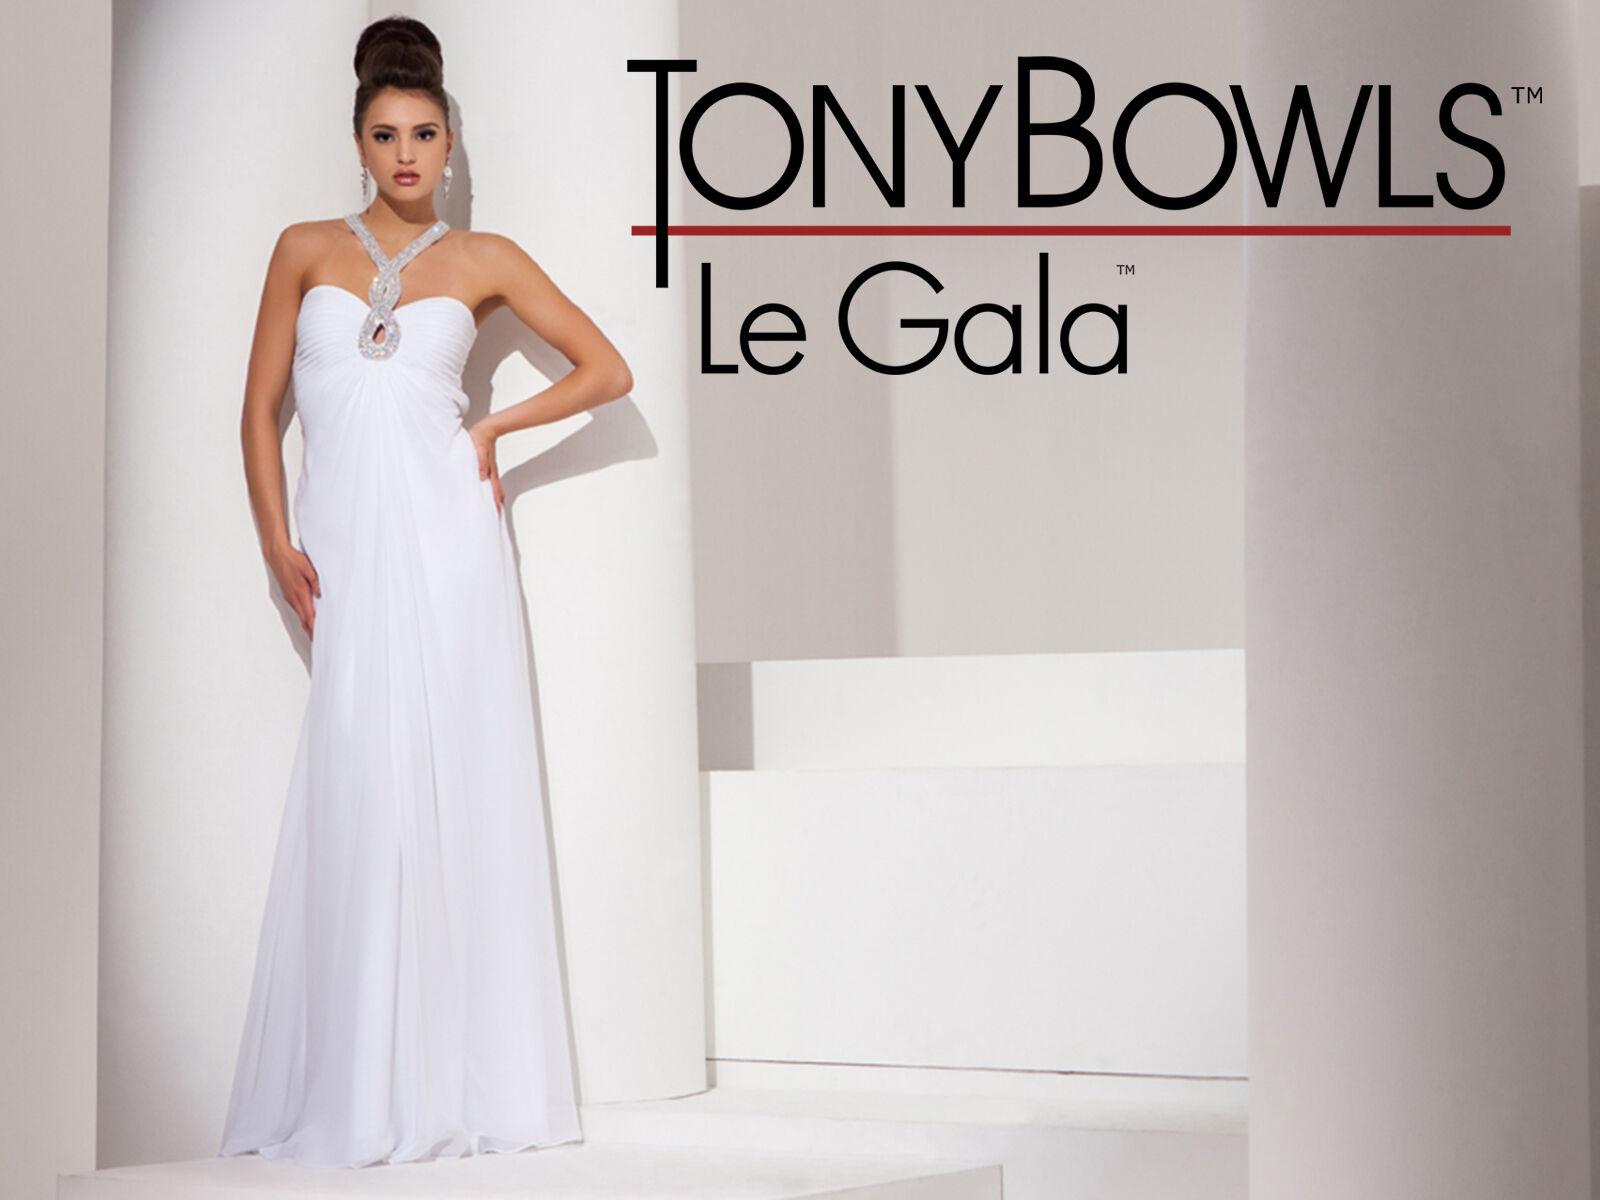 Tony Bowls Le Gala 115504 Color Ivory Size 6 Prom Dress   eBay